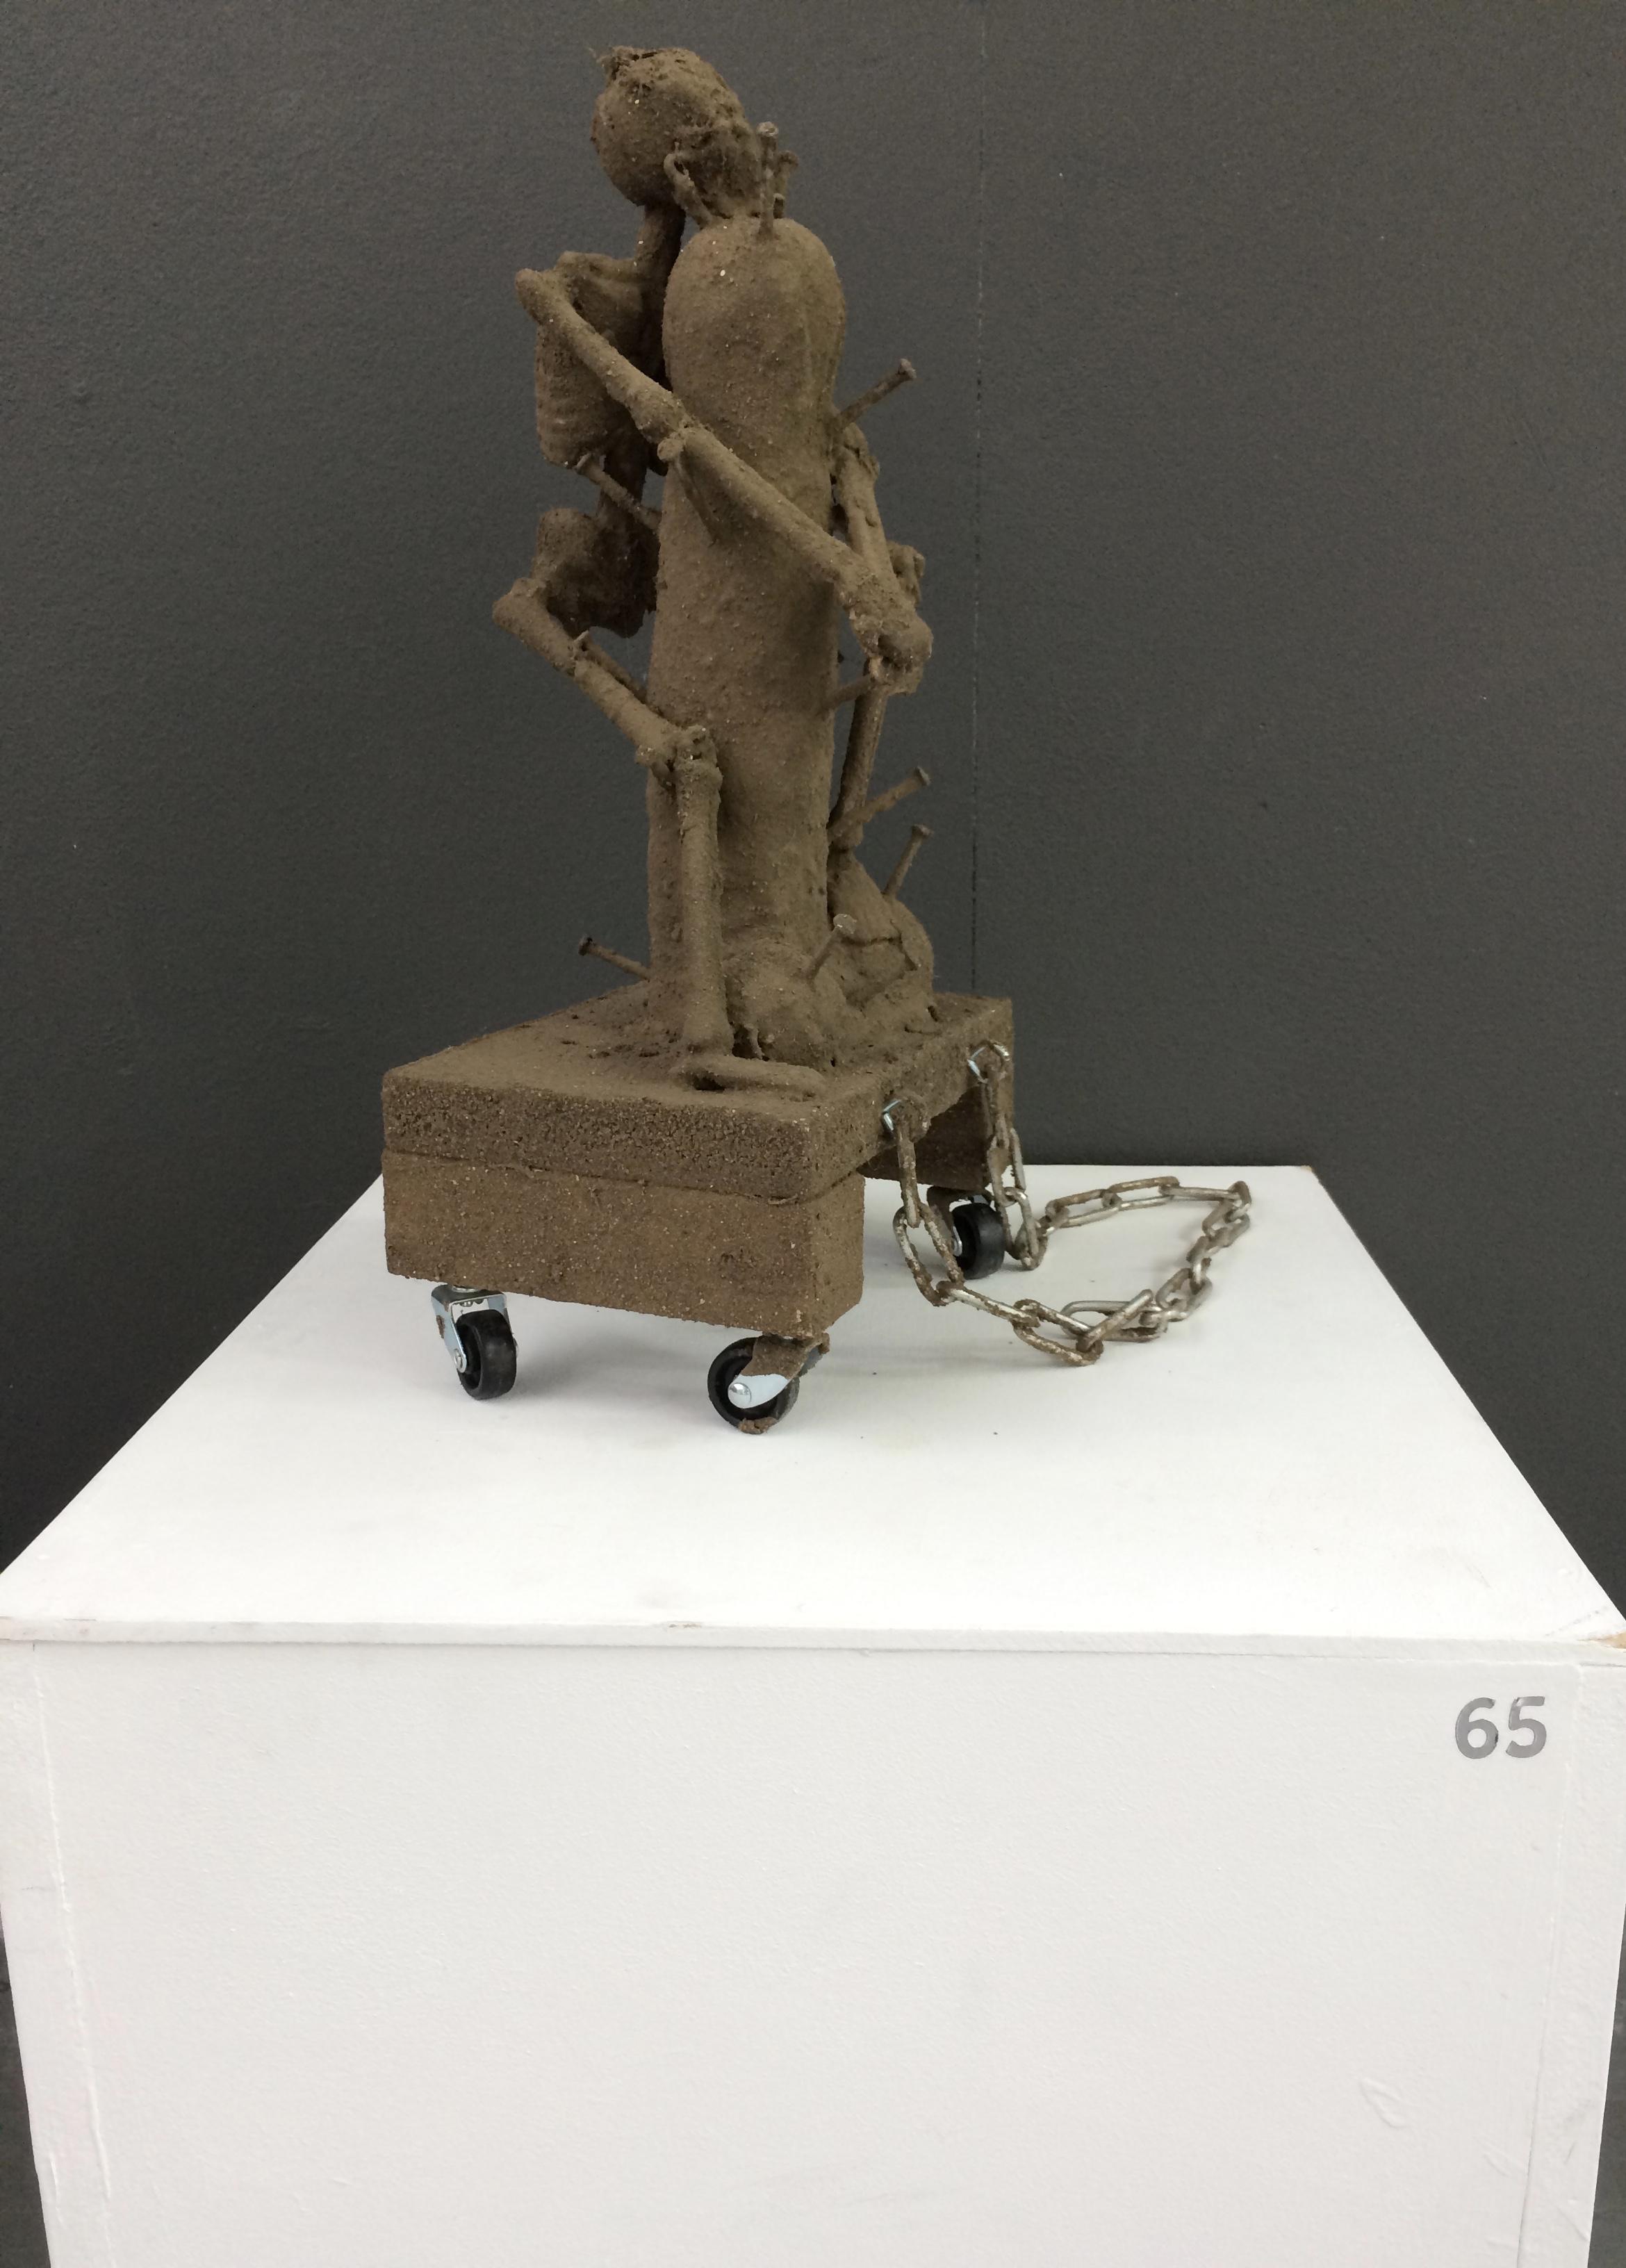 65. Pain O'Cockolatte, David Brown, 34 x 44 x 30cm, £ offers